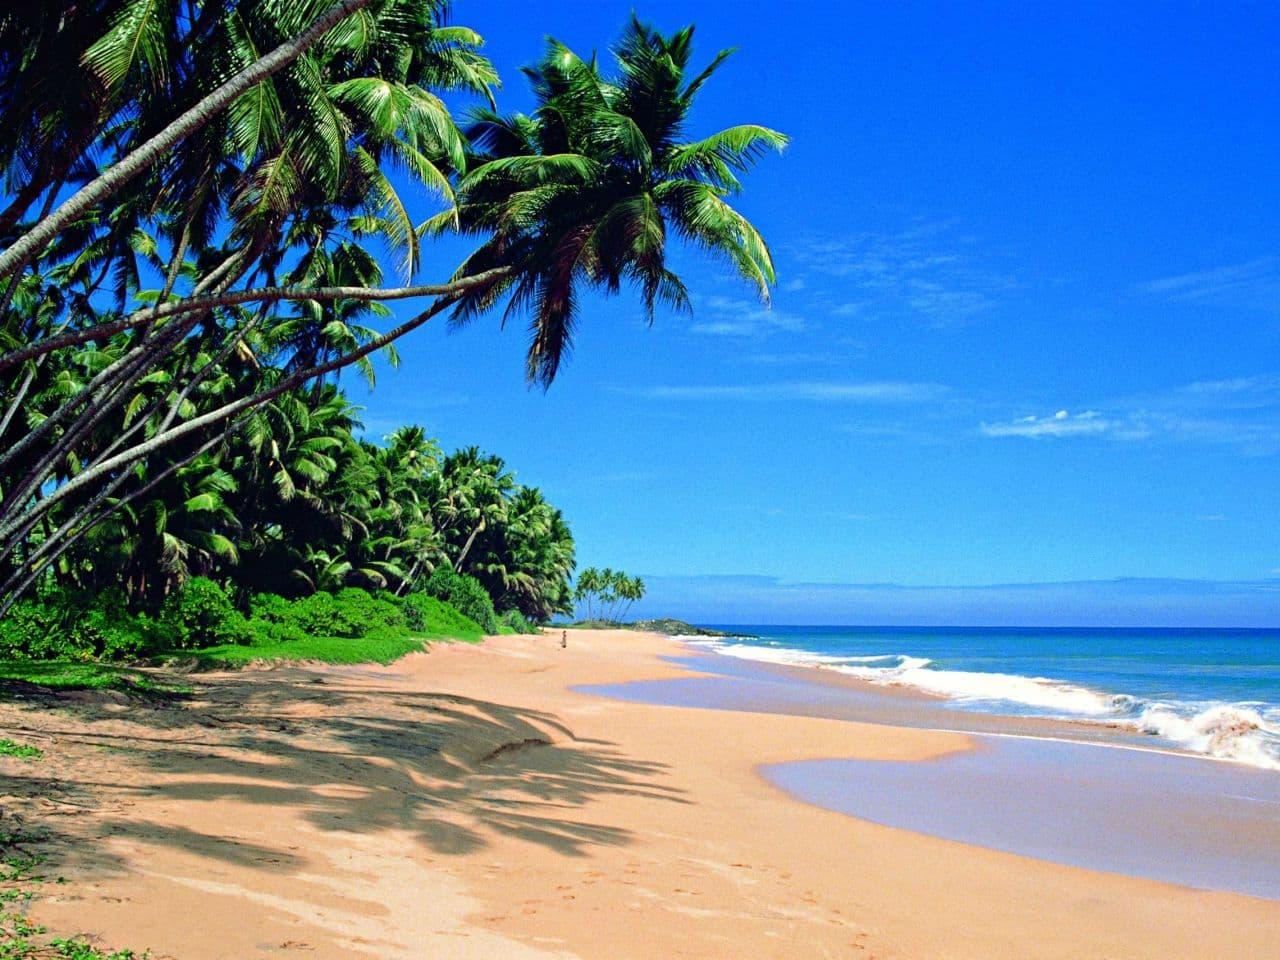 Остров Шри-Ланка -пляжи